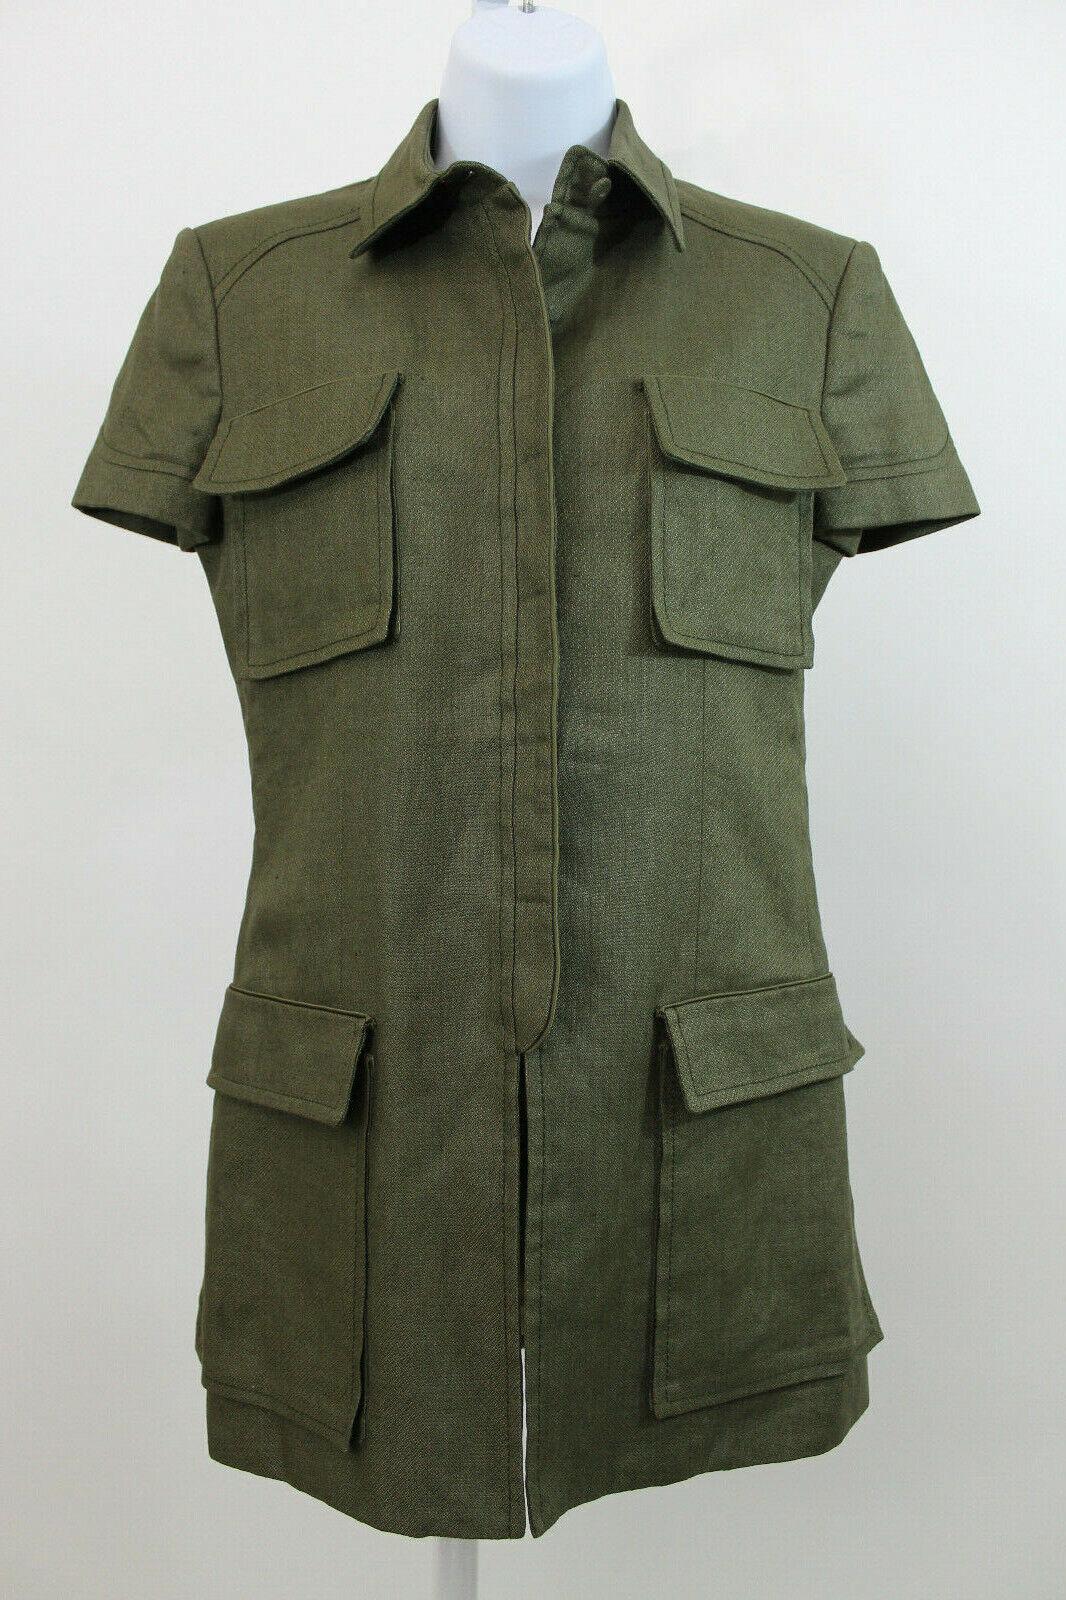 Versace Armeegrün Leinen Seidenmischung Safari Top Größe 38 US 2